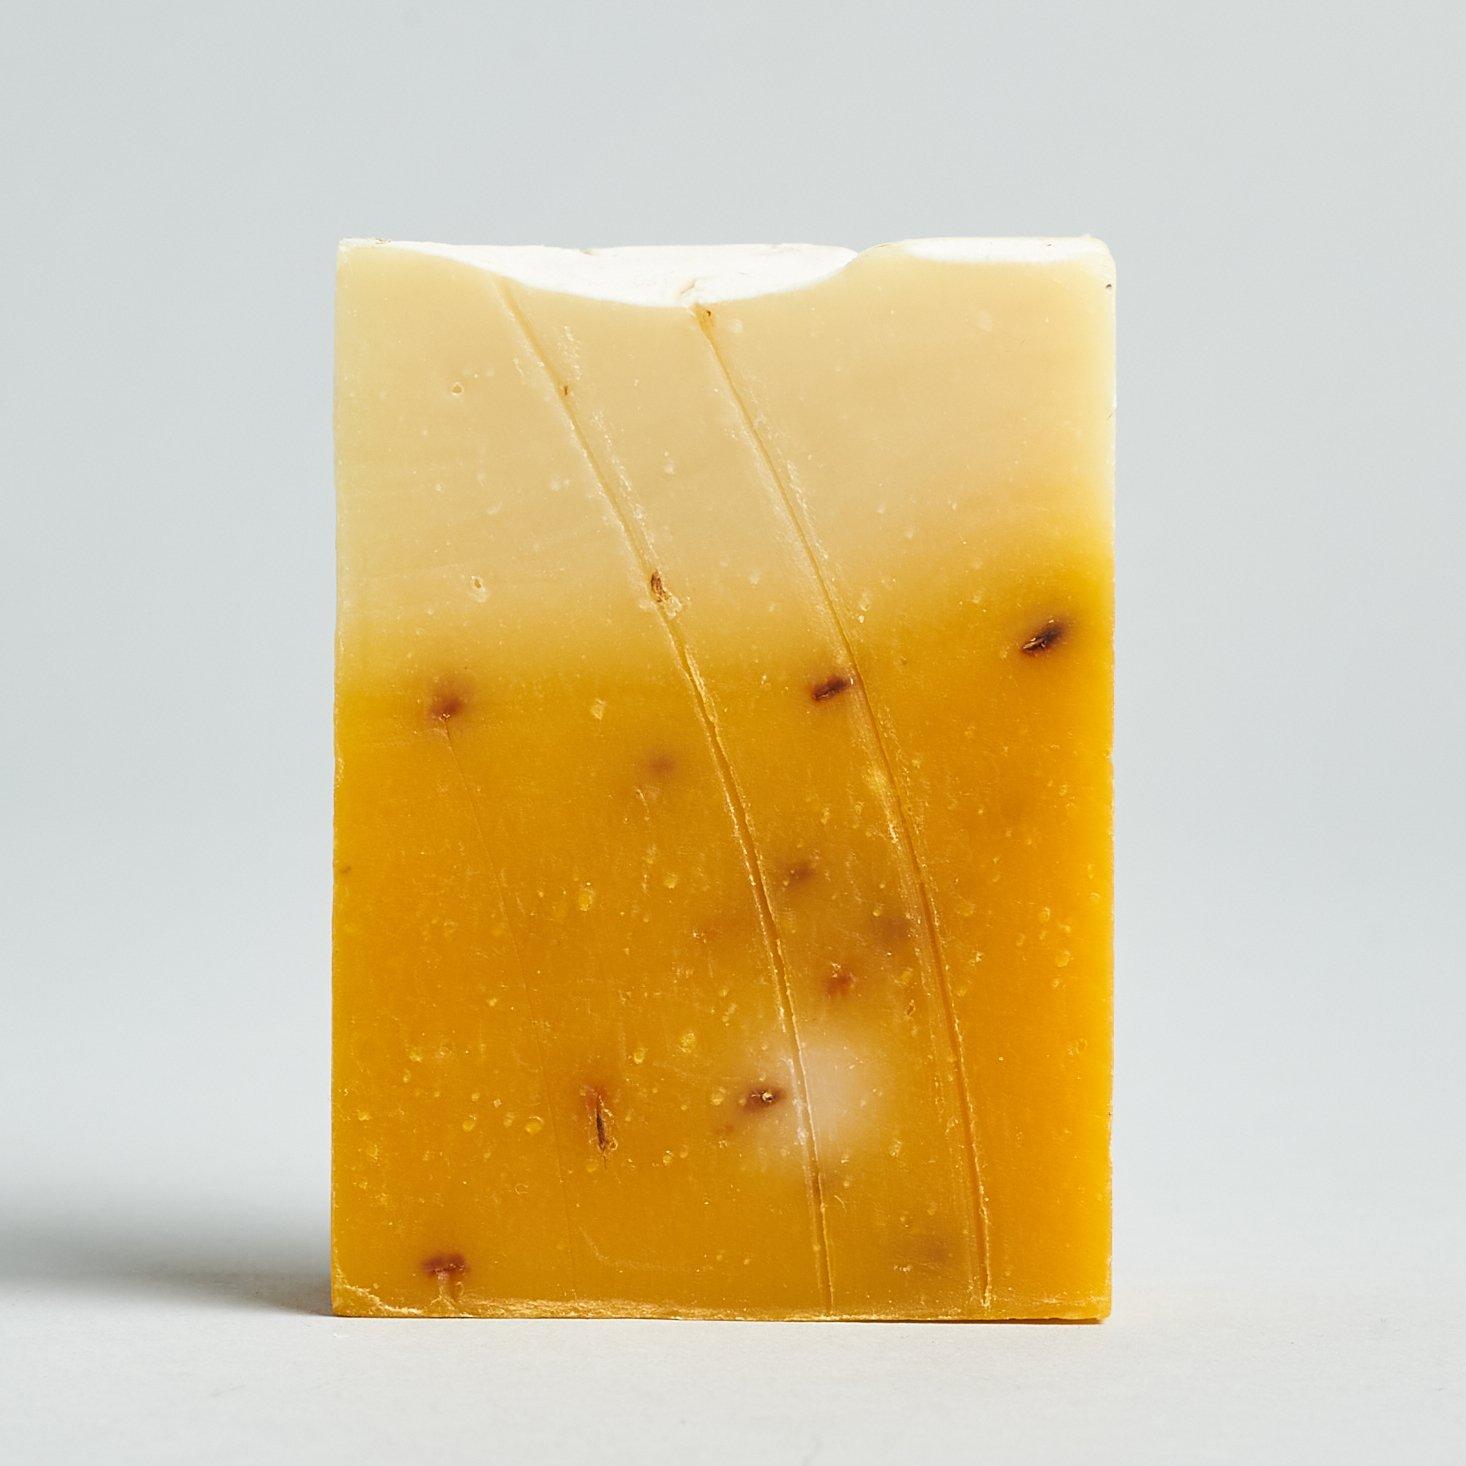 handmade soap from JourneeBox Spring 2021